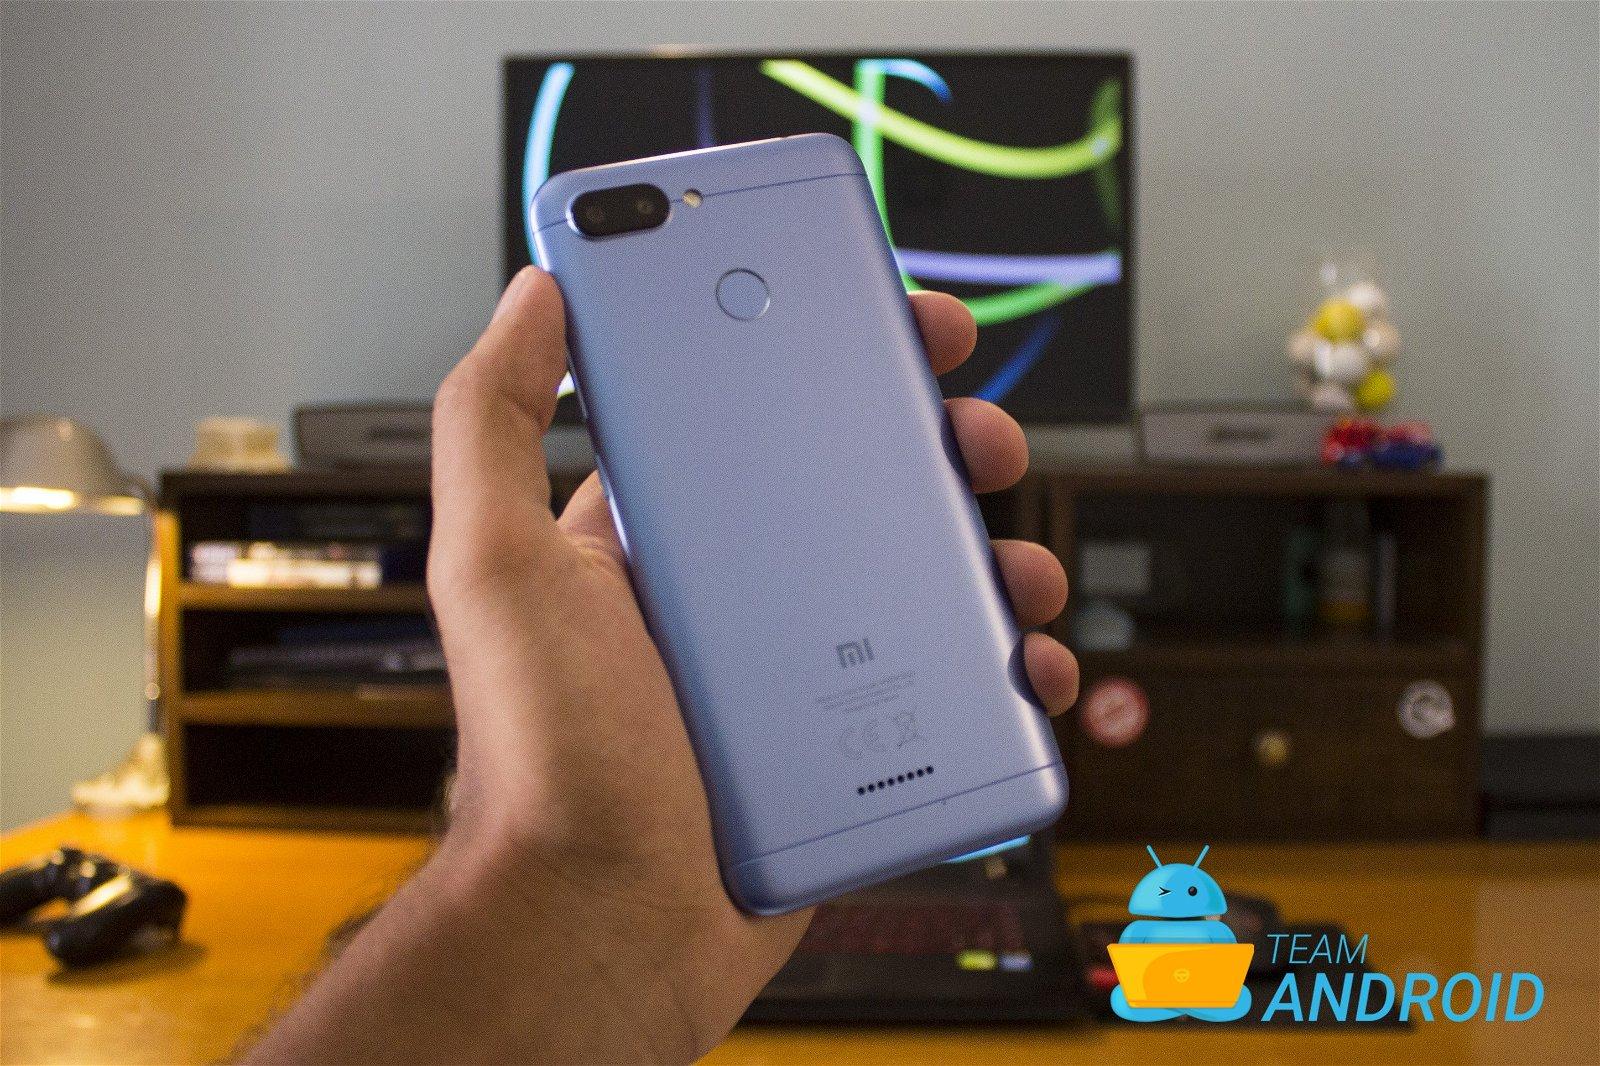 Enter Fastboot Mode on Xiaomi Redmi 6 / 6A [How To] - Tutorial